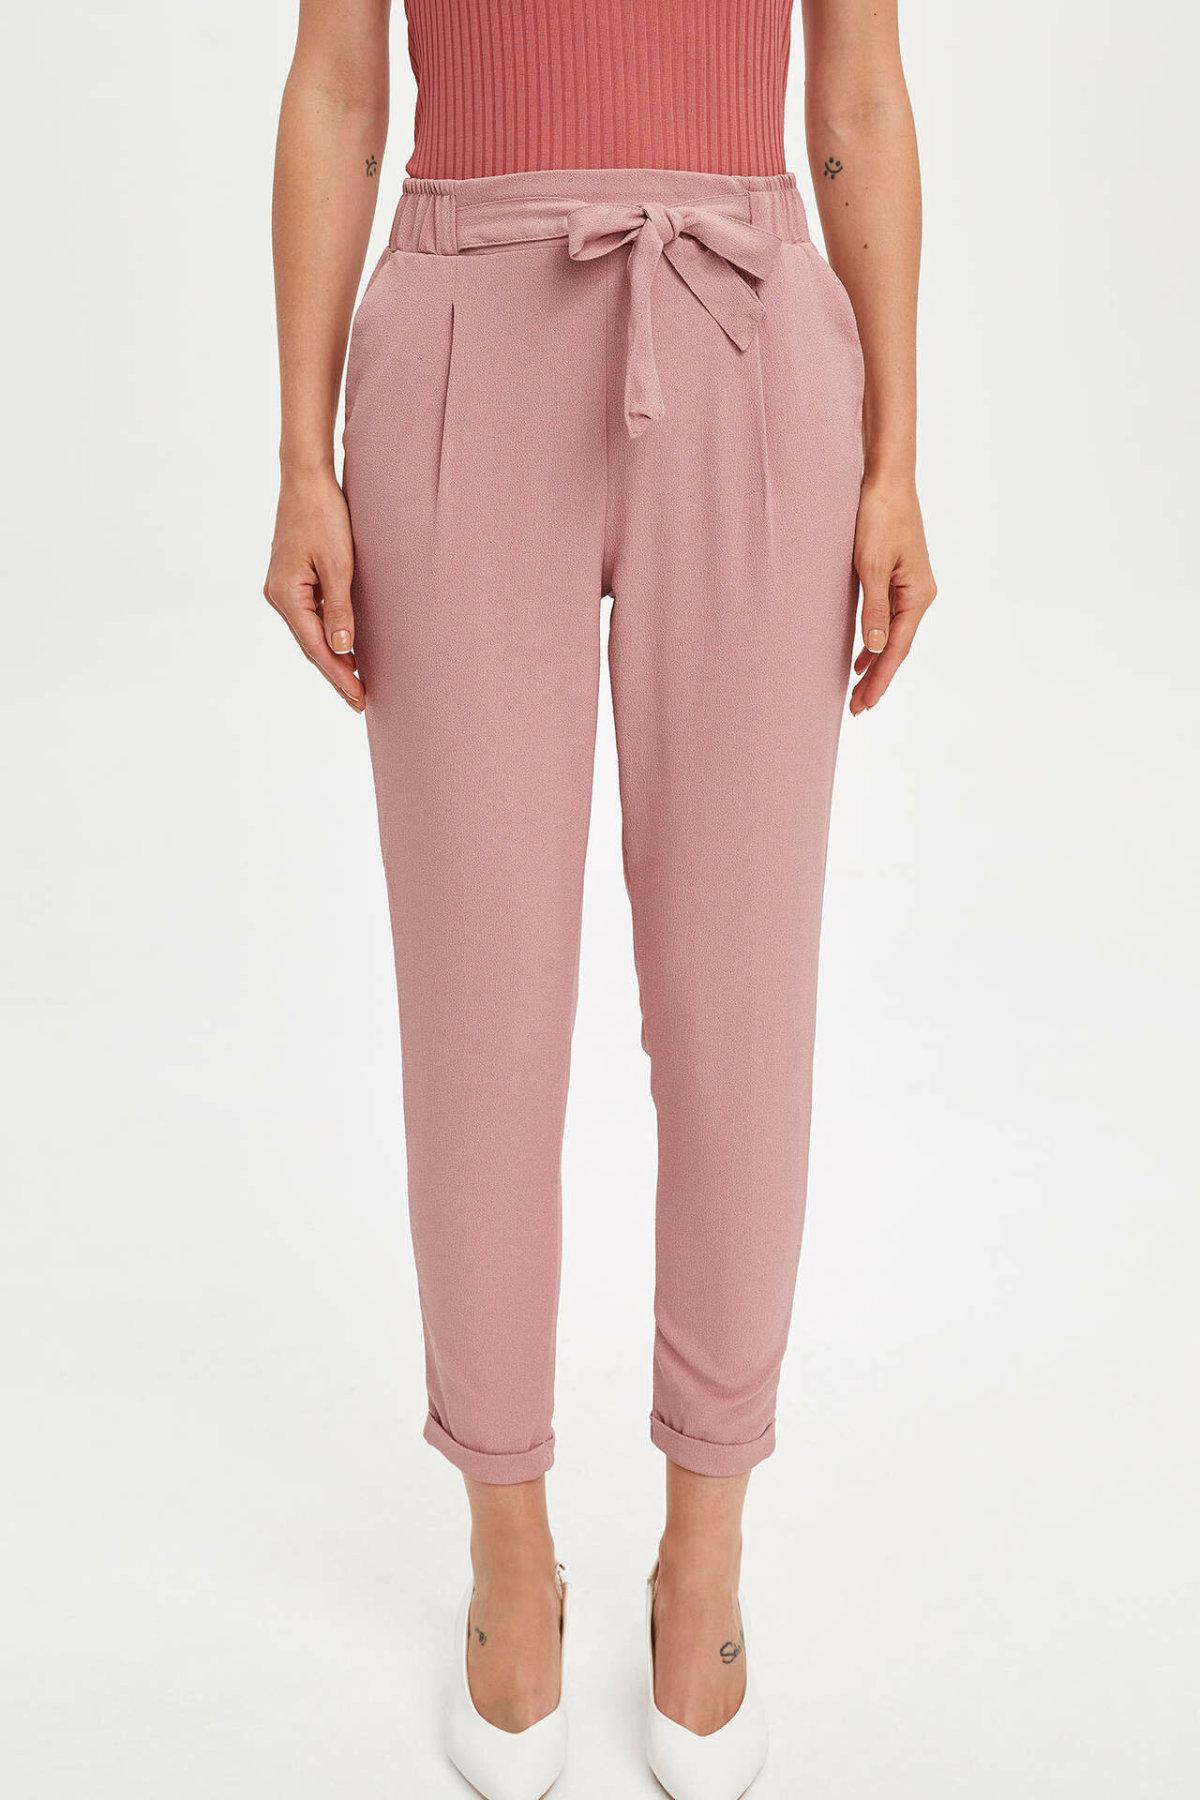 DeFacto Woman Summer Pink Chiffon Ninth Pants Women Lace-up Belt Bottoms Women Cargo Pants Lady Trousers-K9477AZ19SM